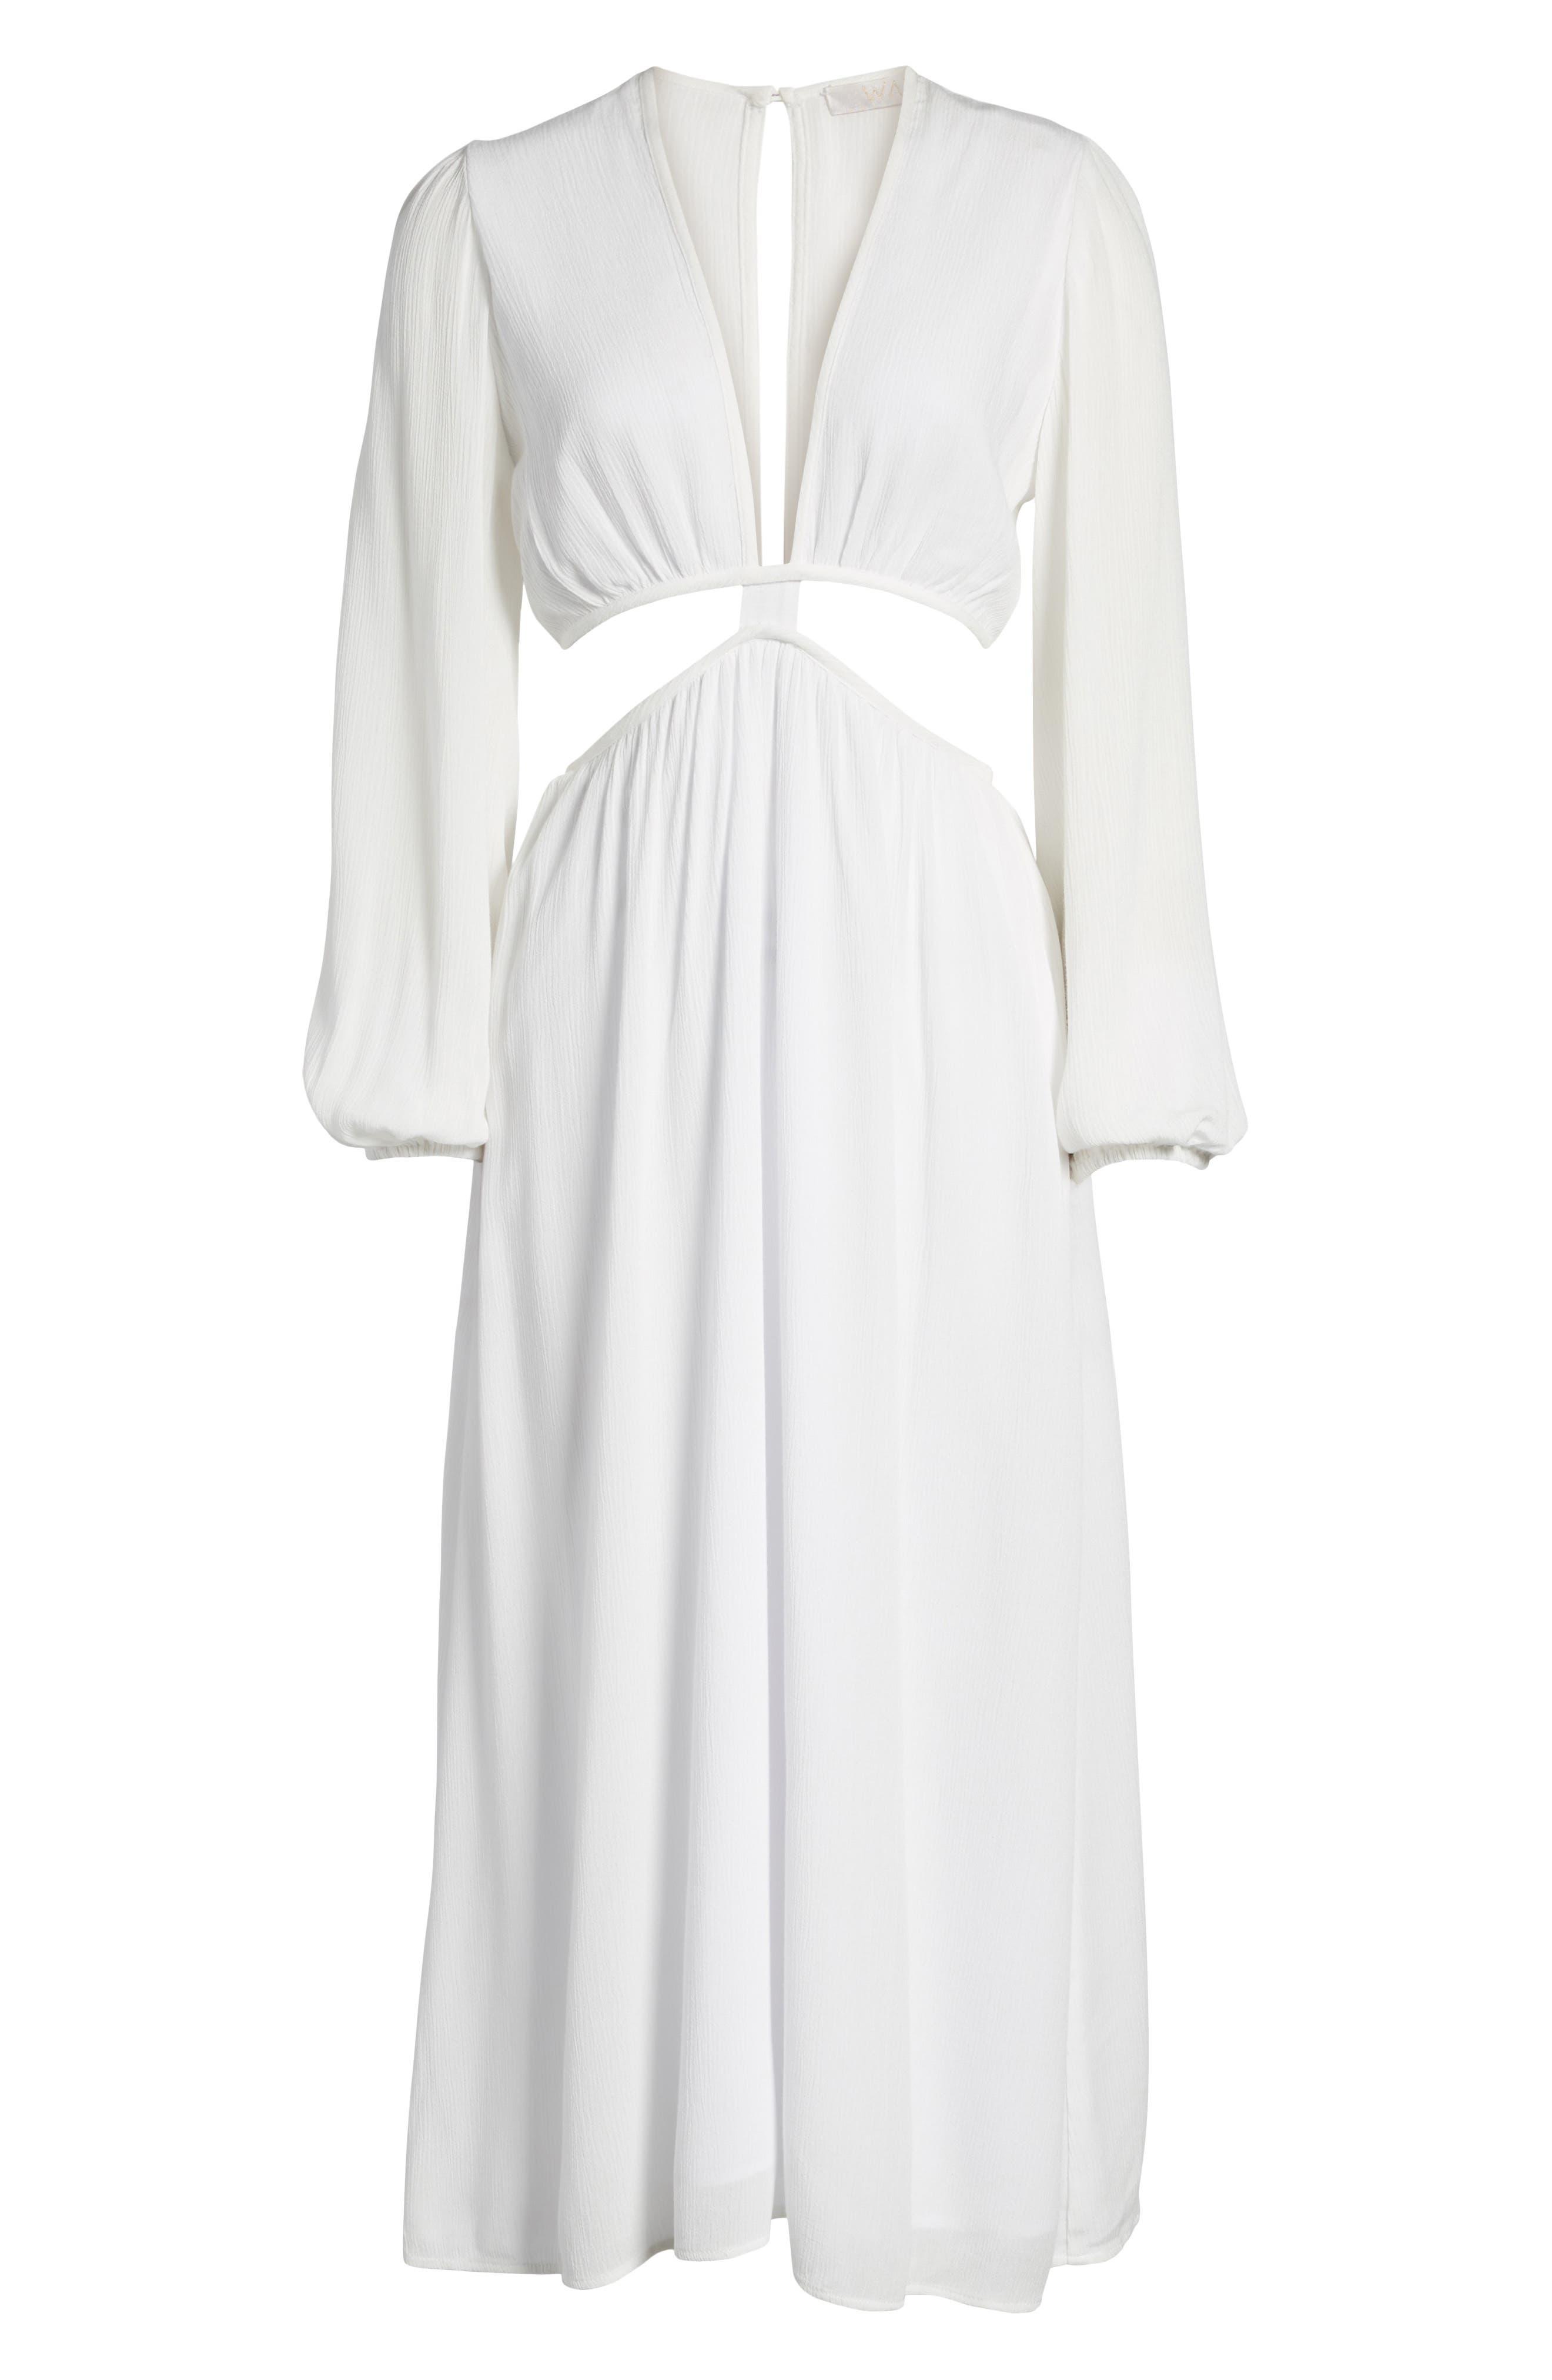 WAYF,                             Babylon Cutout Dress,                             Alternate thumbnail 8, color,                             900